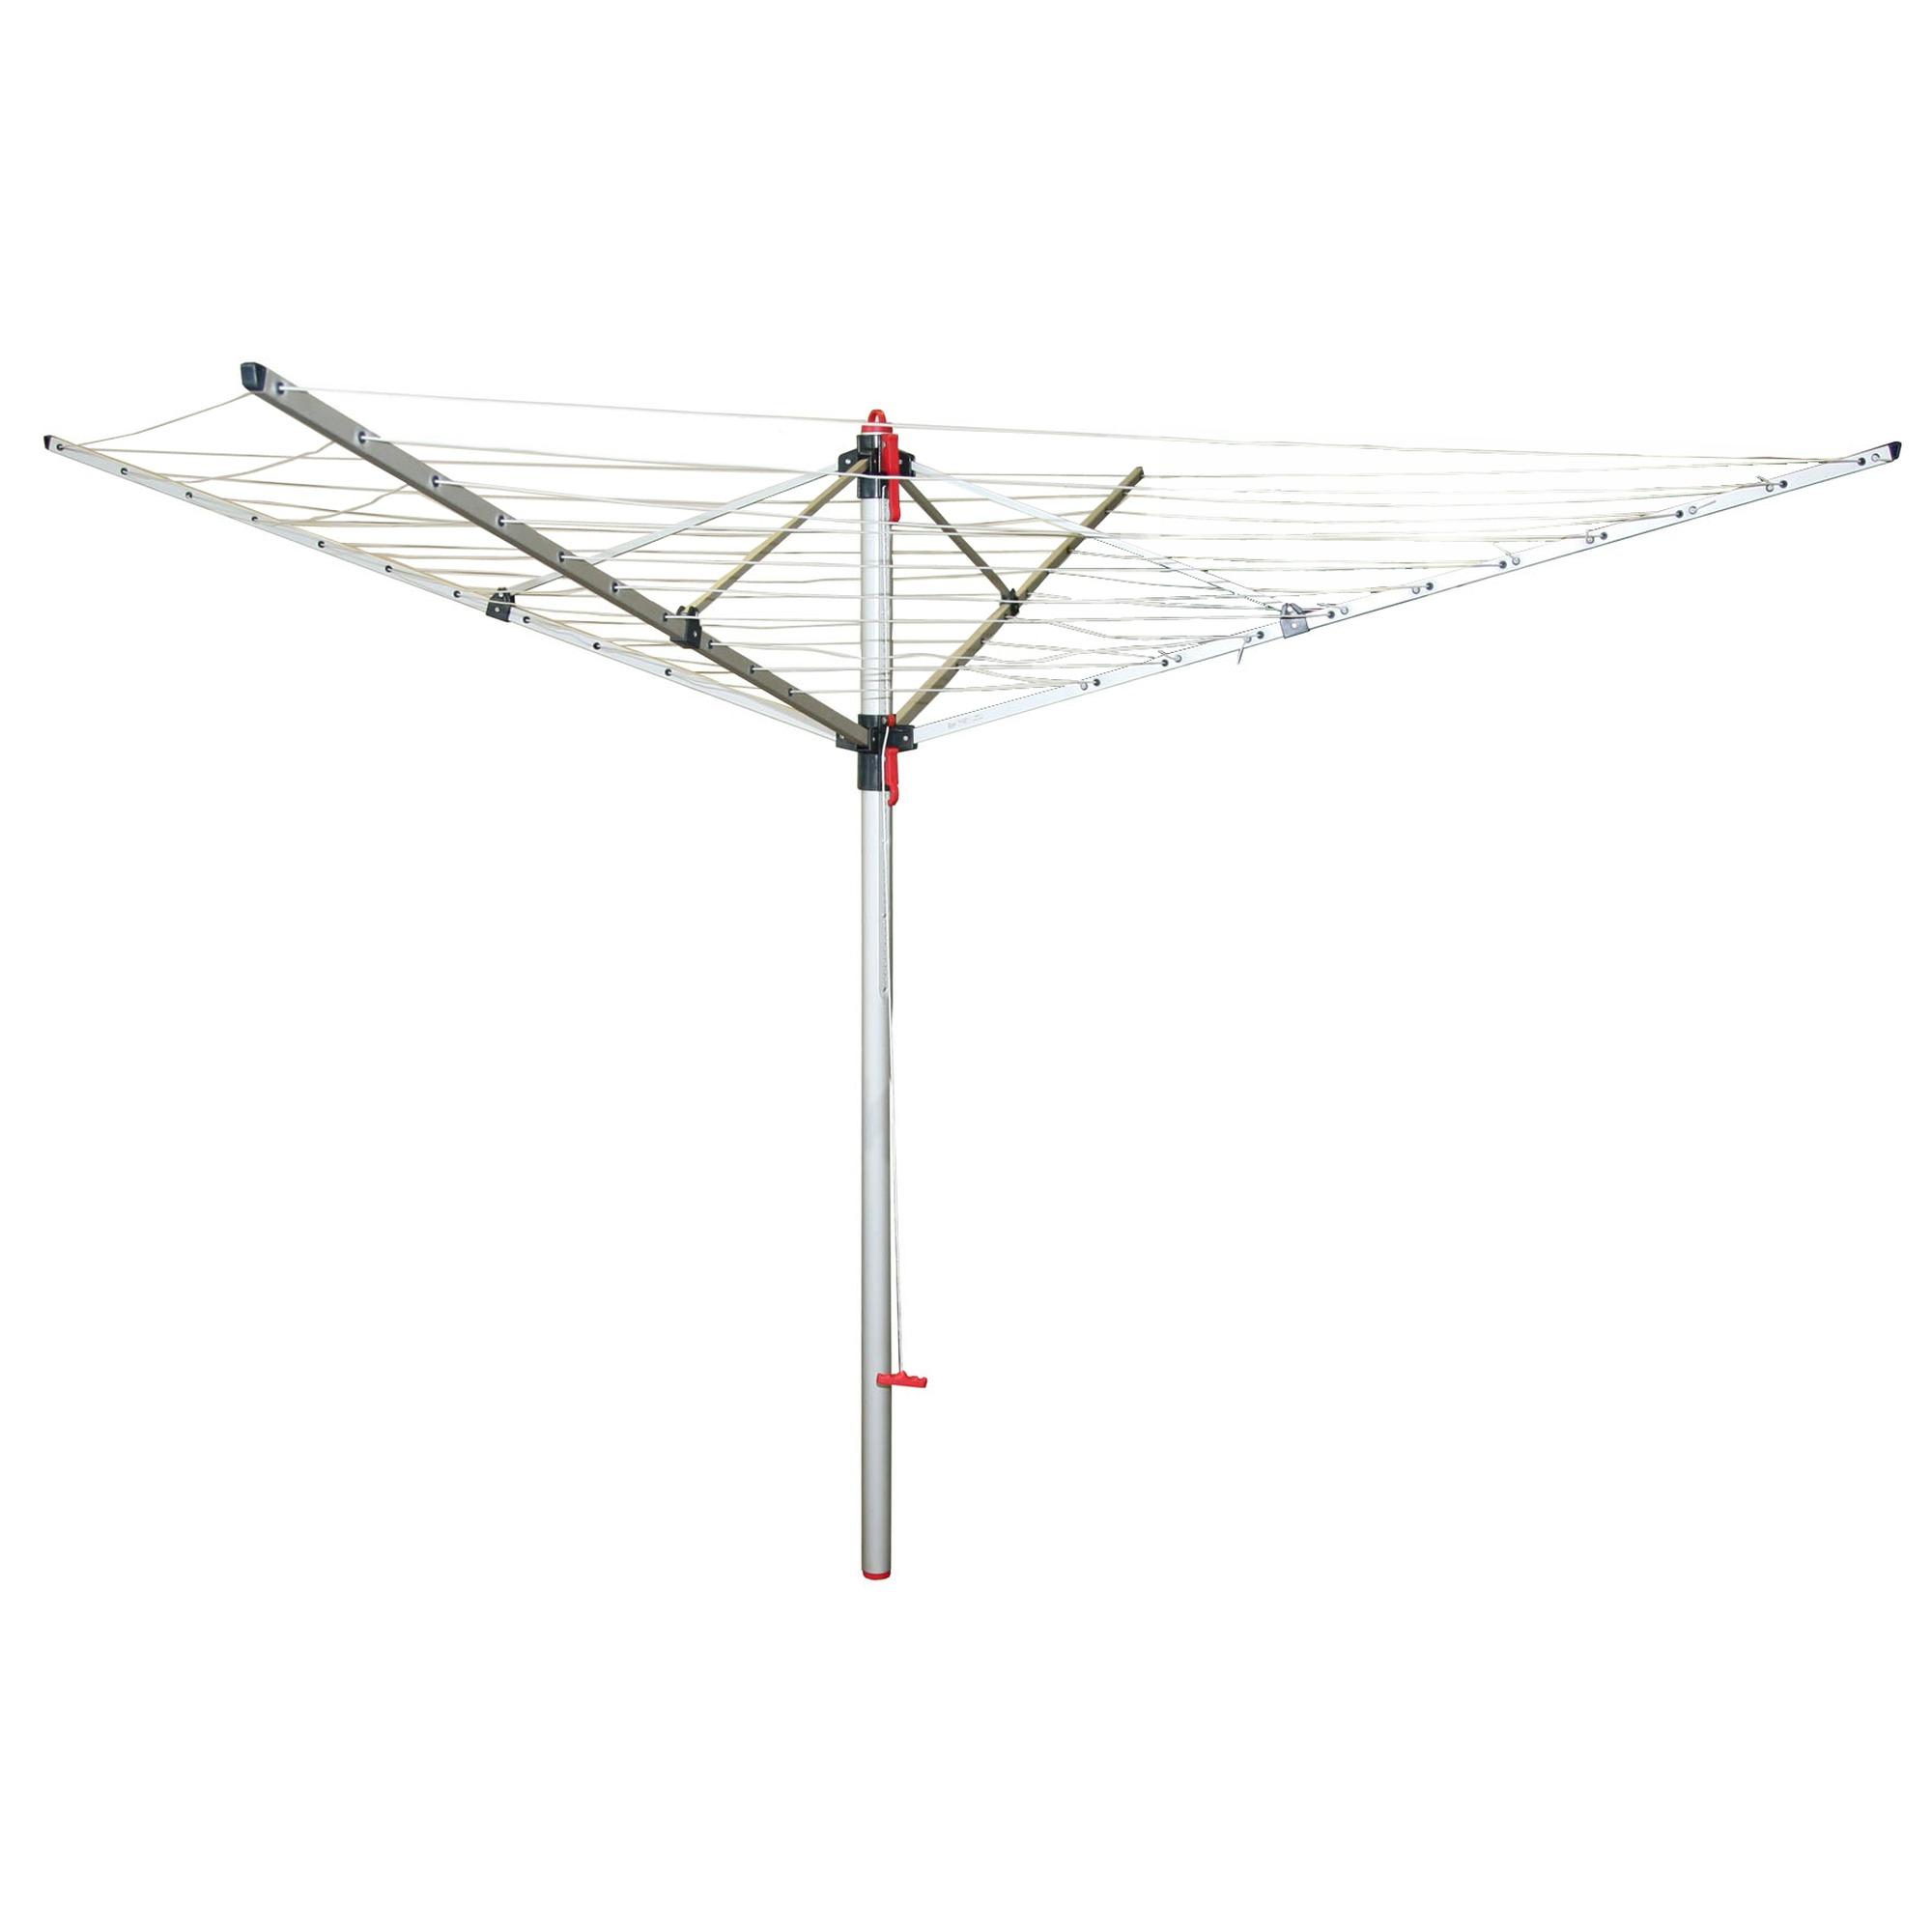 s choir parapluie viva air ultra light vileda gris. Black Bedroom Furniture Sets. Home Design Ideas